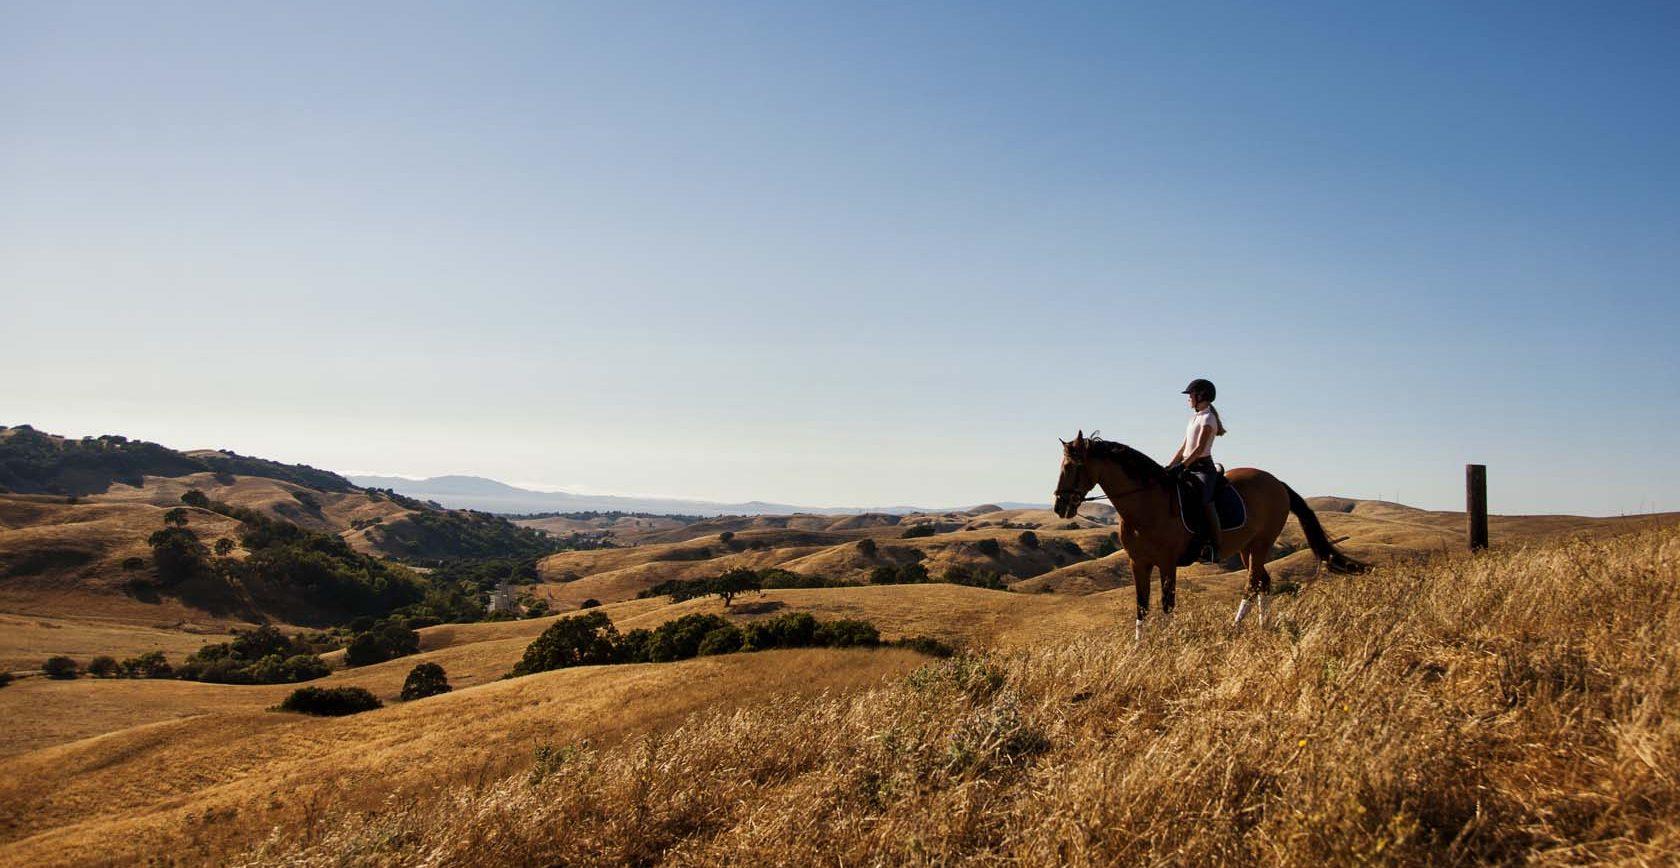 A woman on horseback explores the views of Sky Ranch